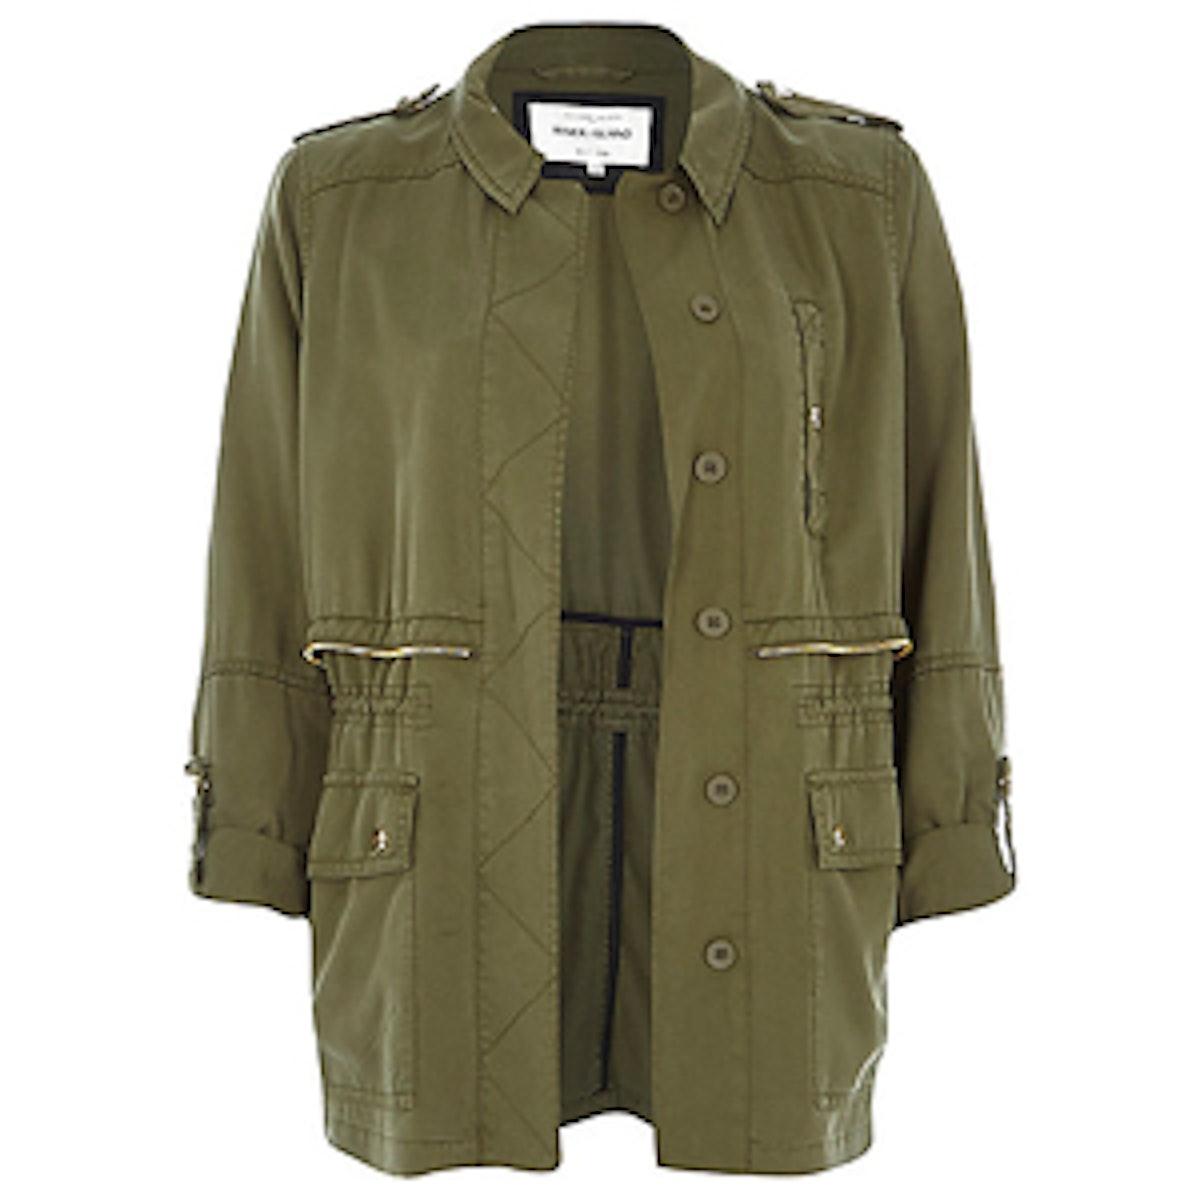 Khaki Utility Military Casual Jacket